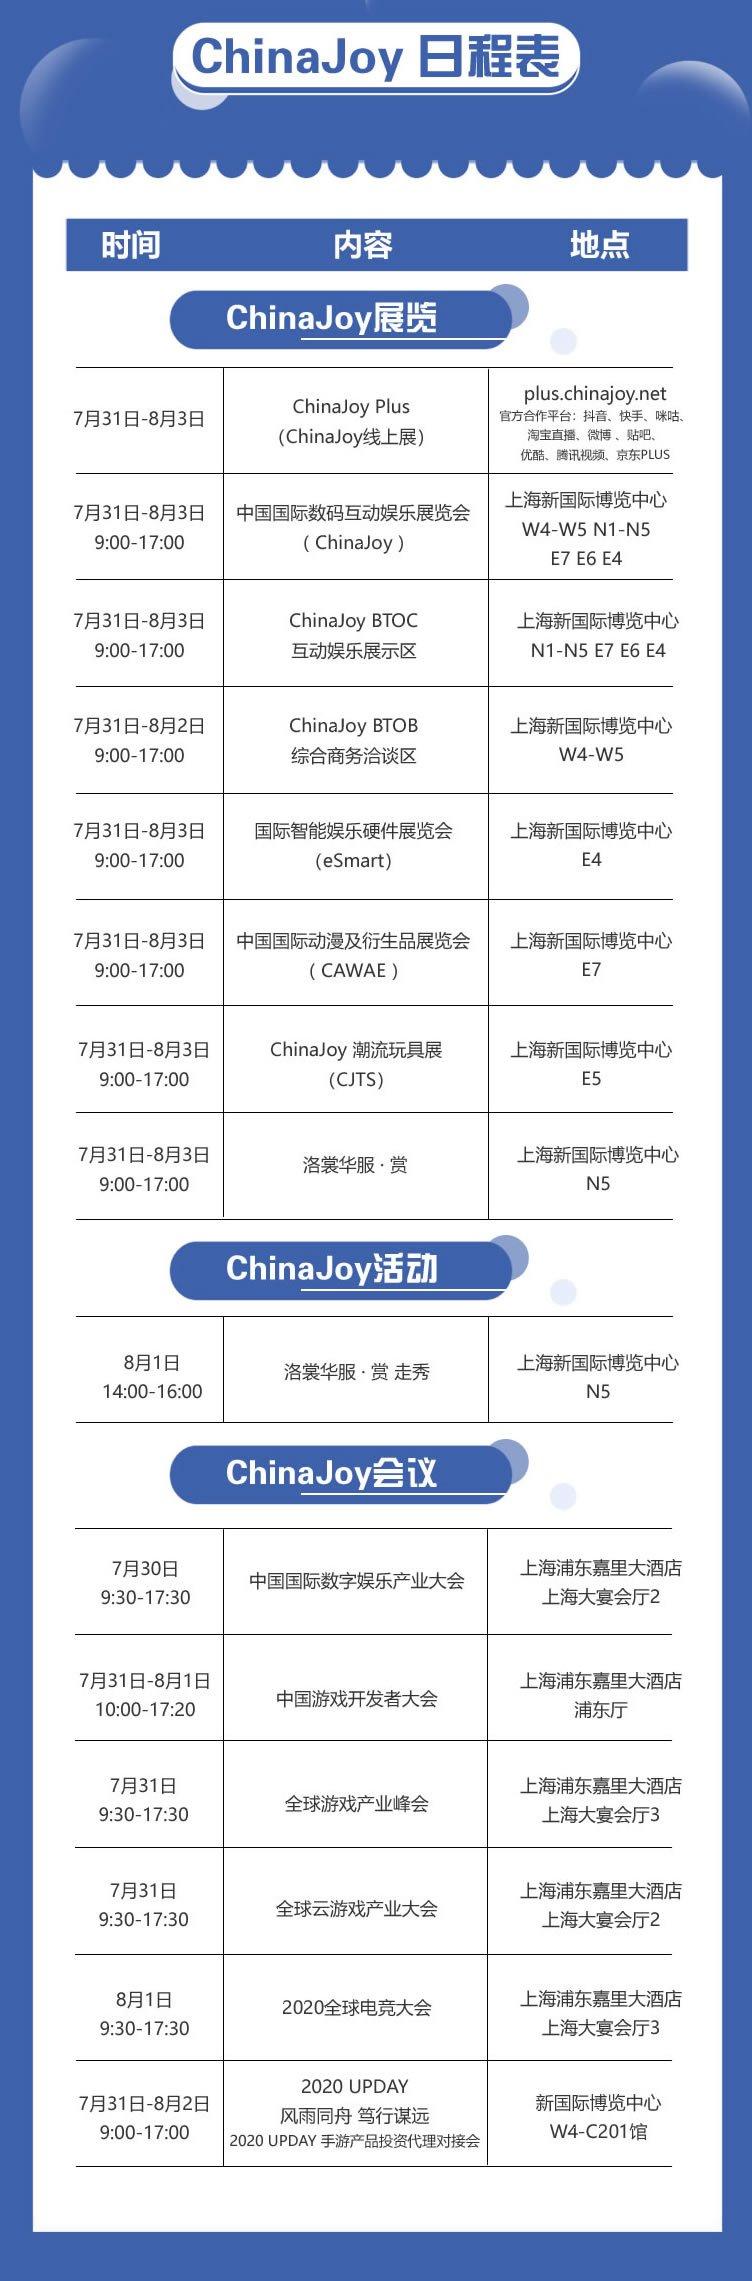 2020ChinaJoy直播地址入口介绍